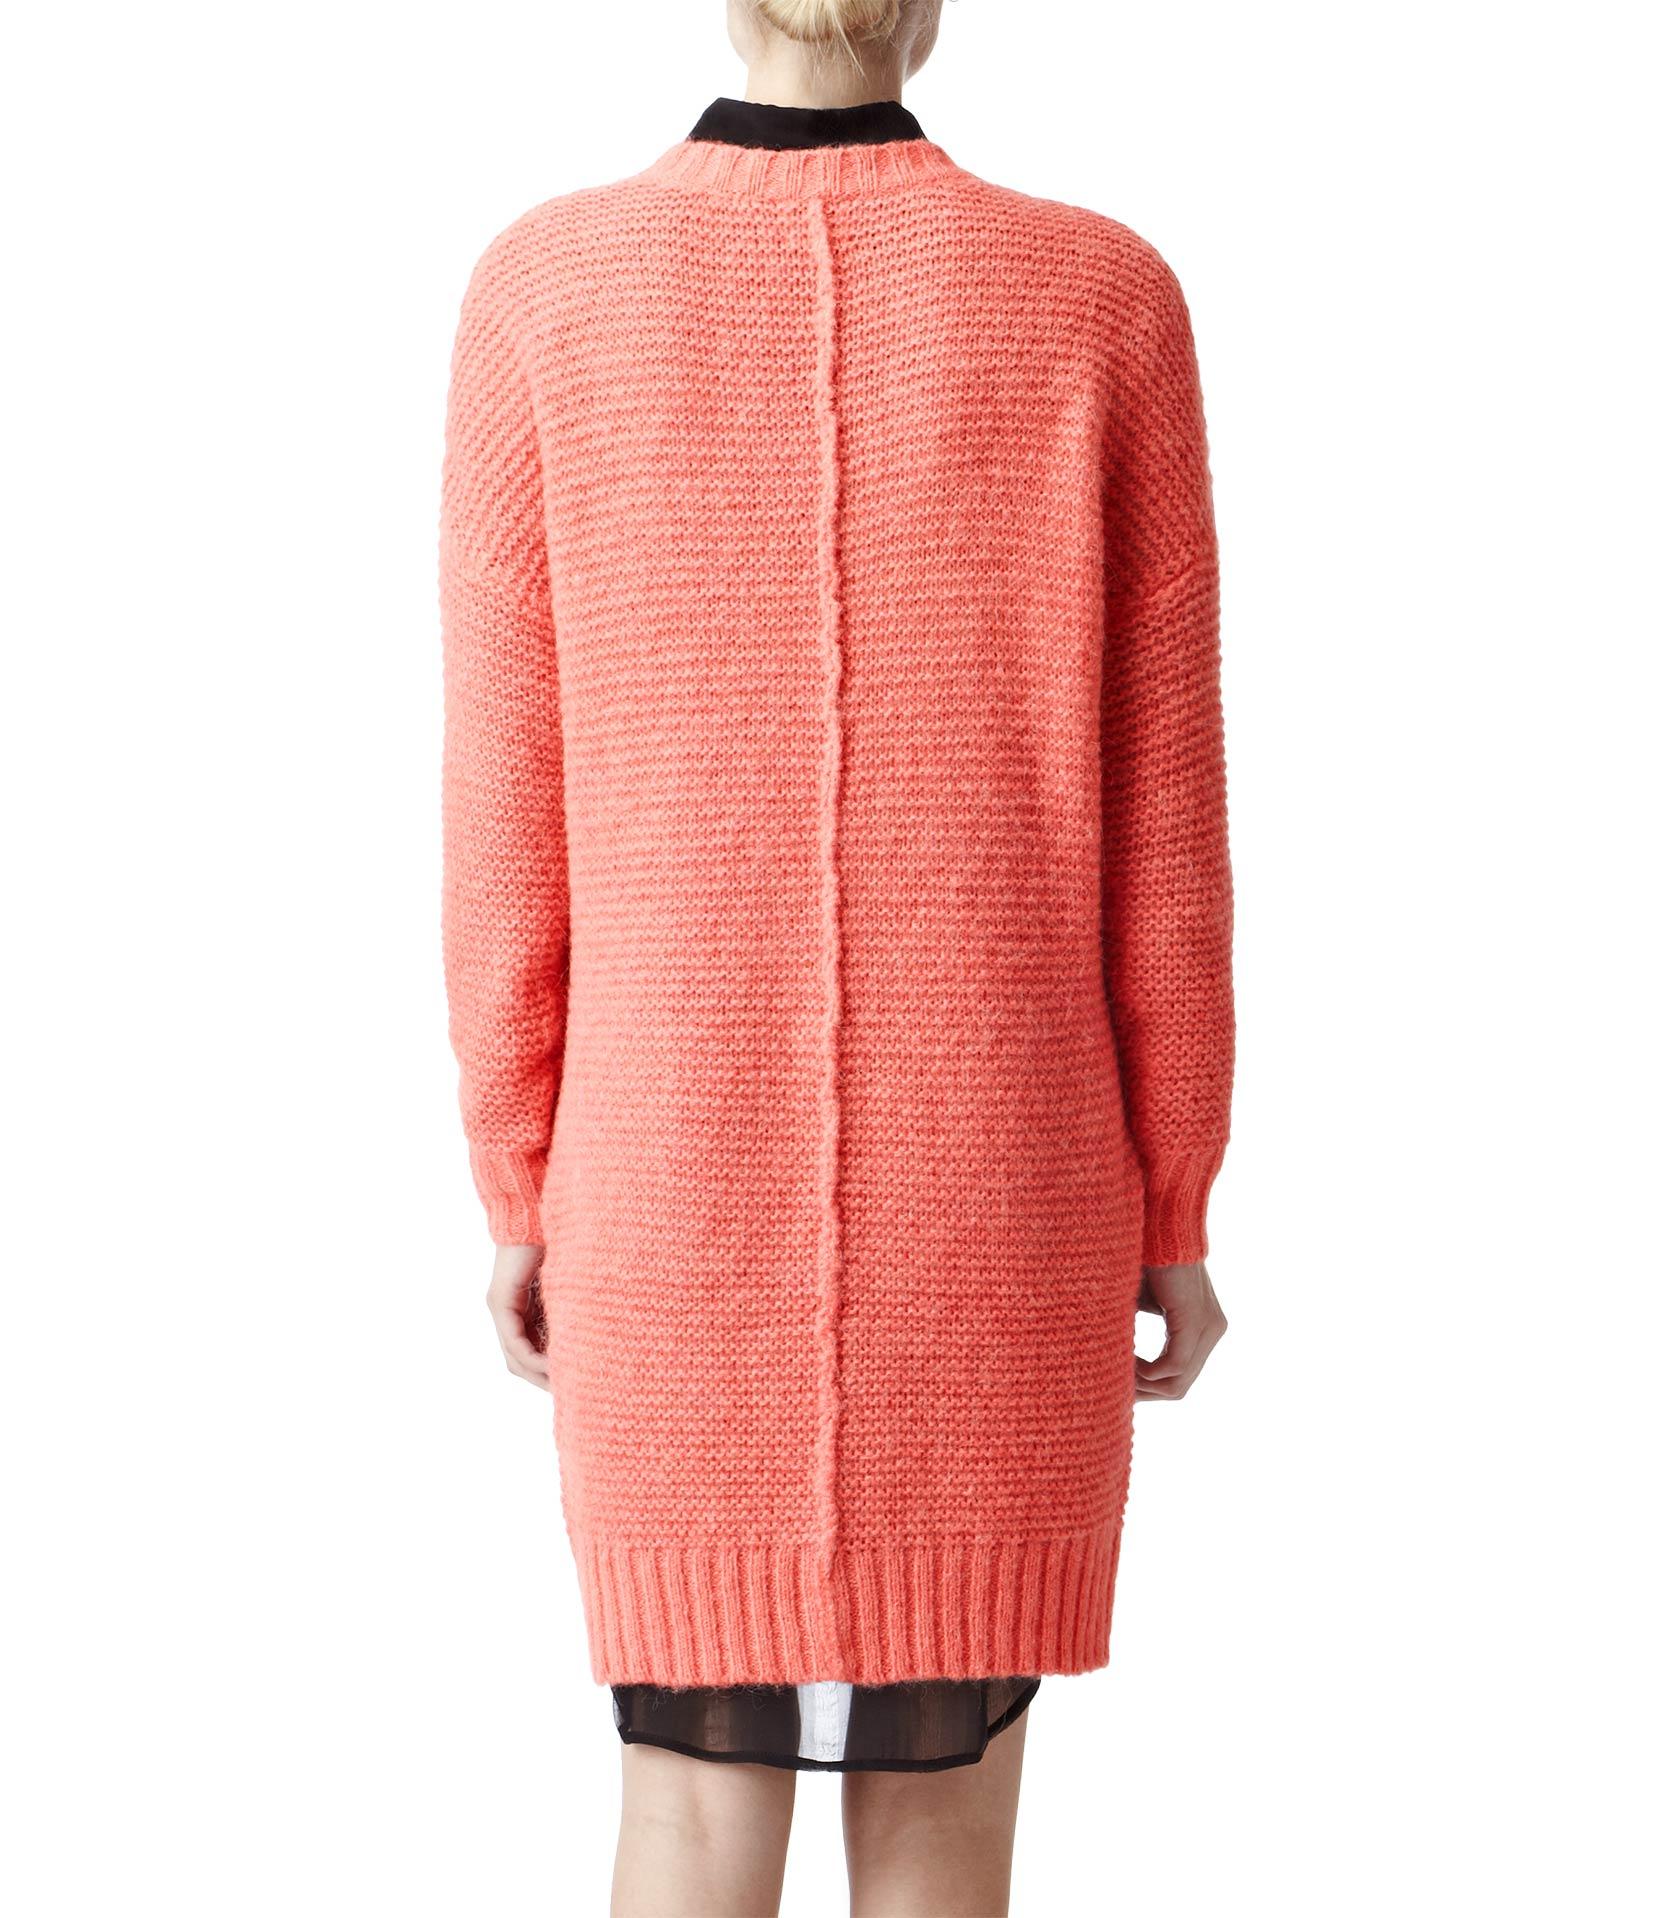 63d7ef1304 Reiss Loose Knit Dress in Pink - Lyst